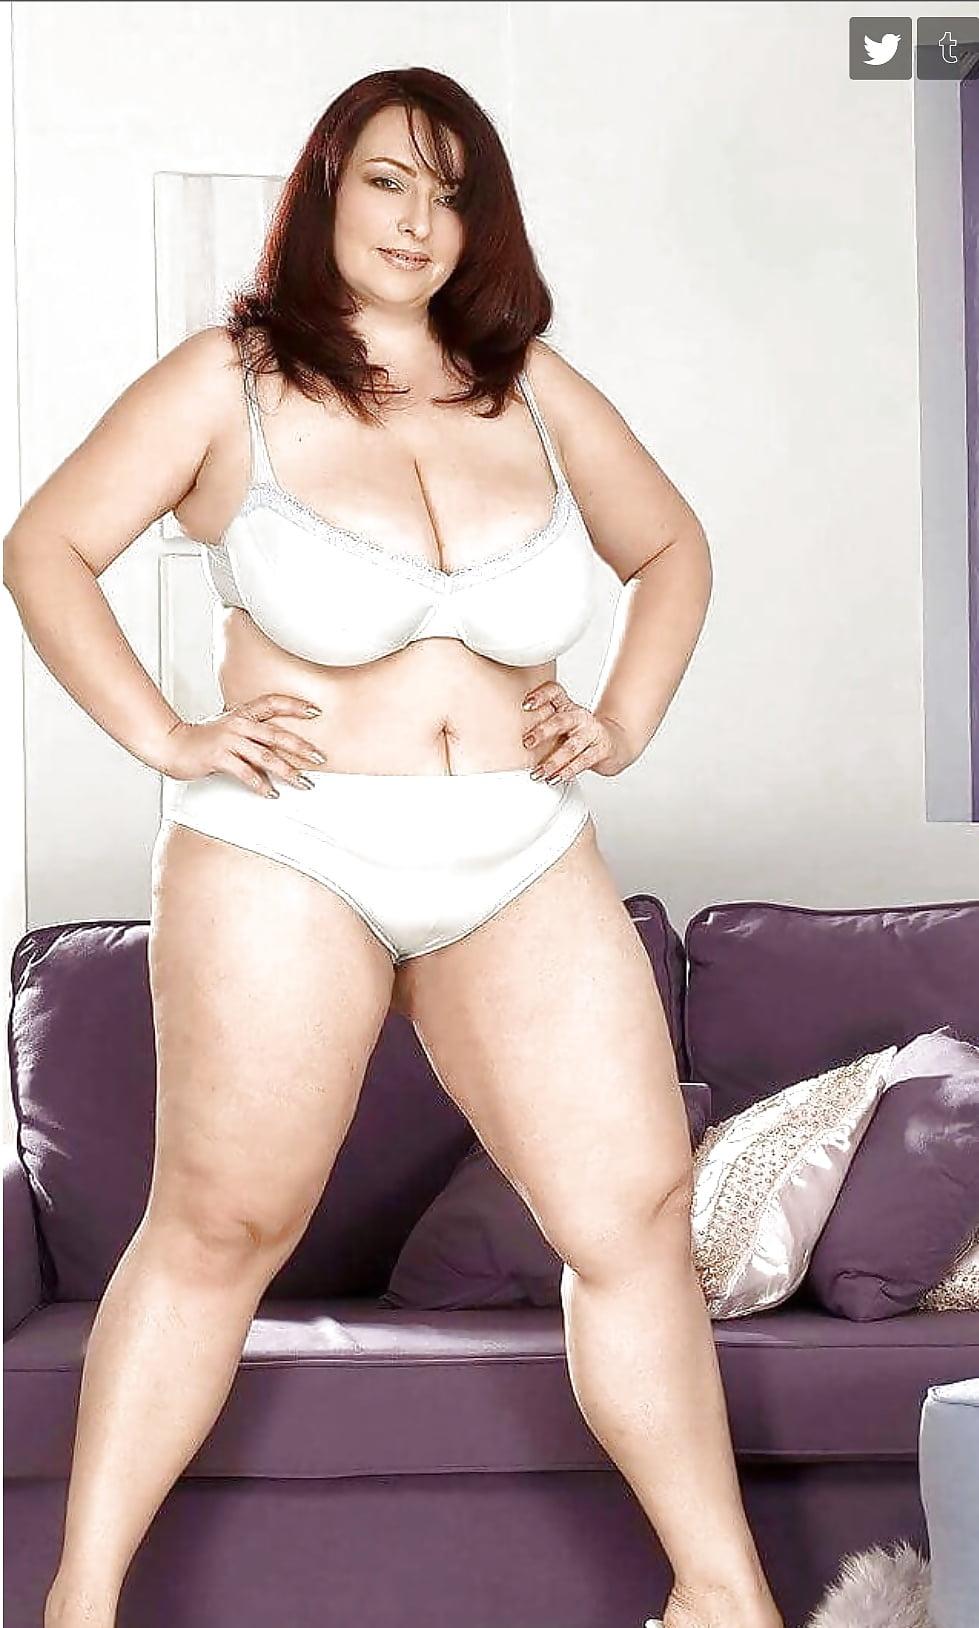 Xl girl blanka pictures, nude female porn star having sex